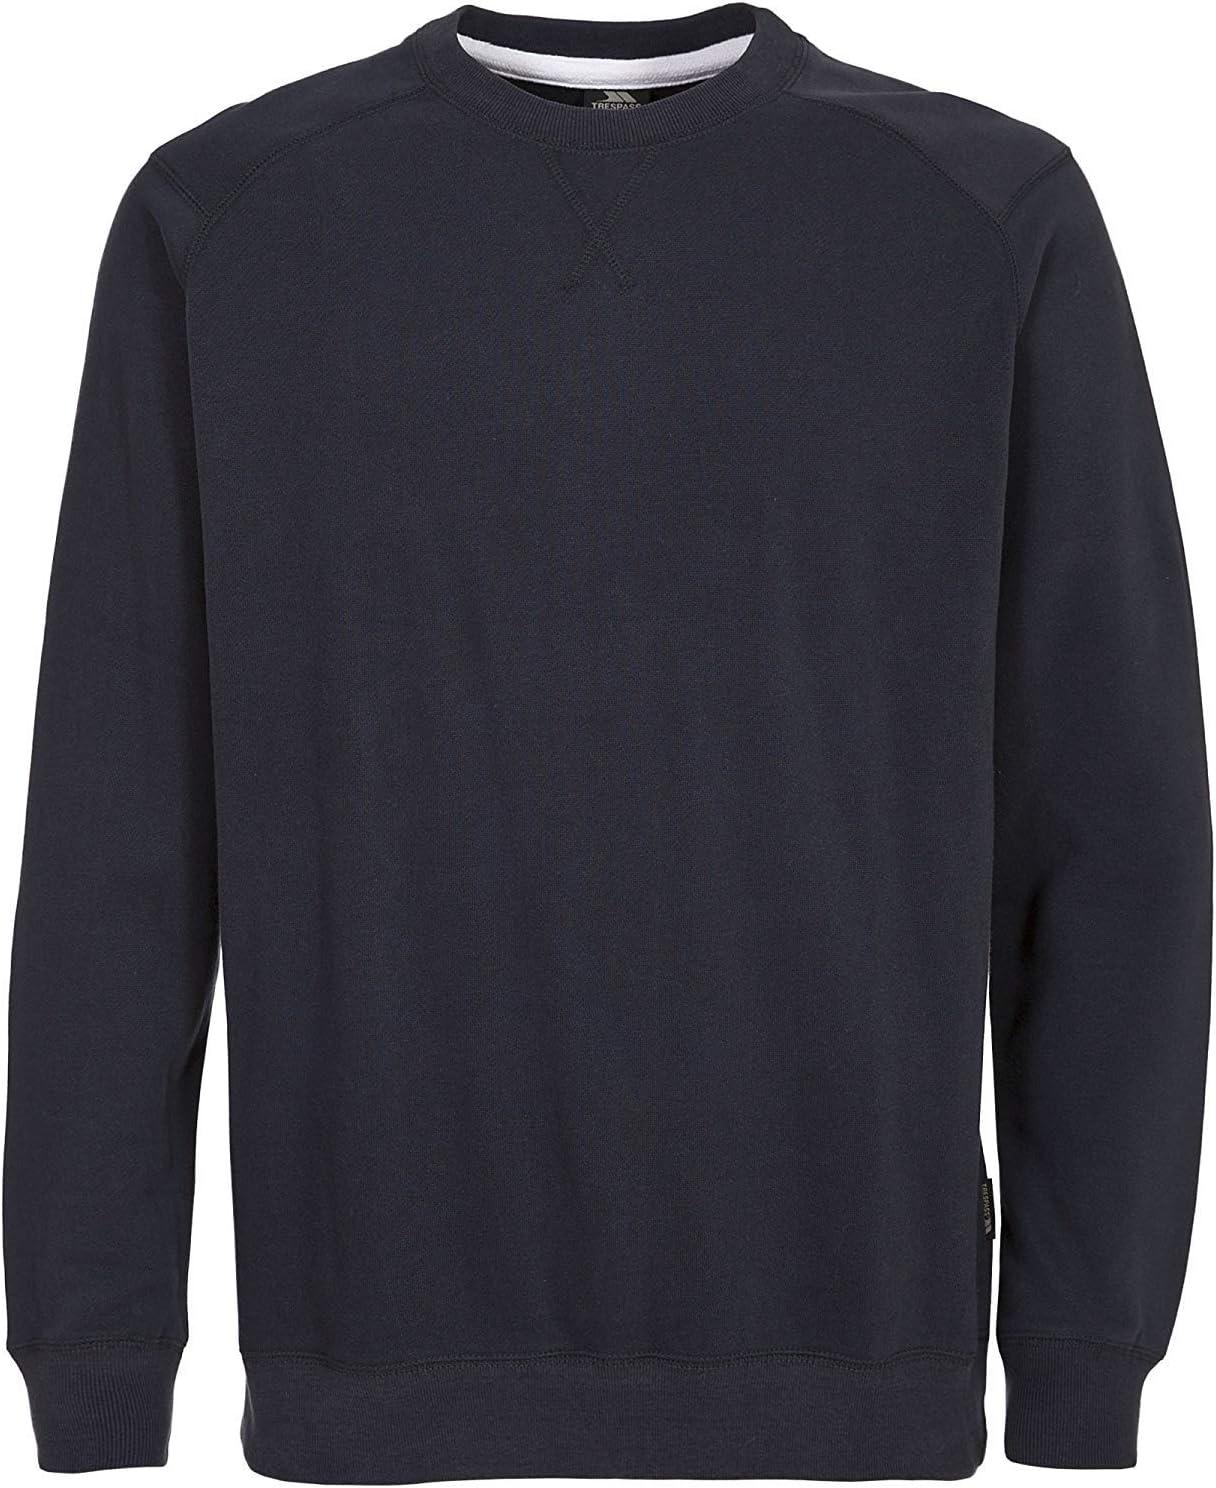 Hombre Trespass THURLES Male Sweater Gris -